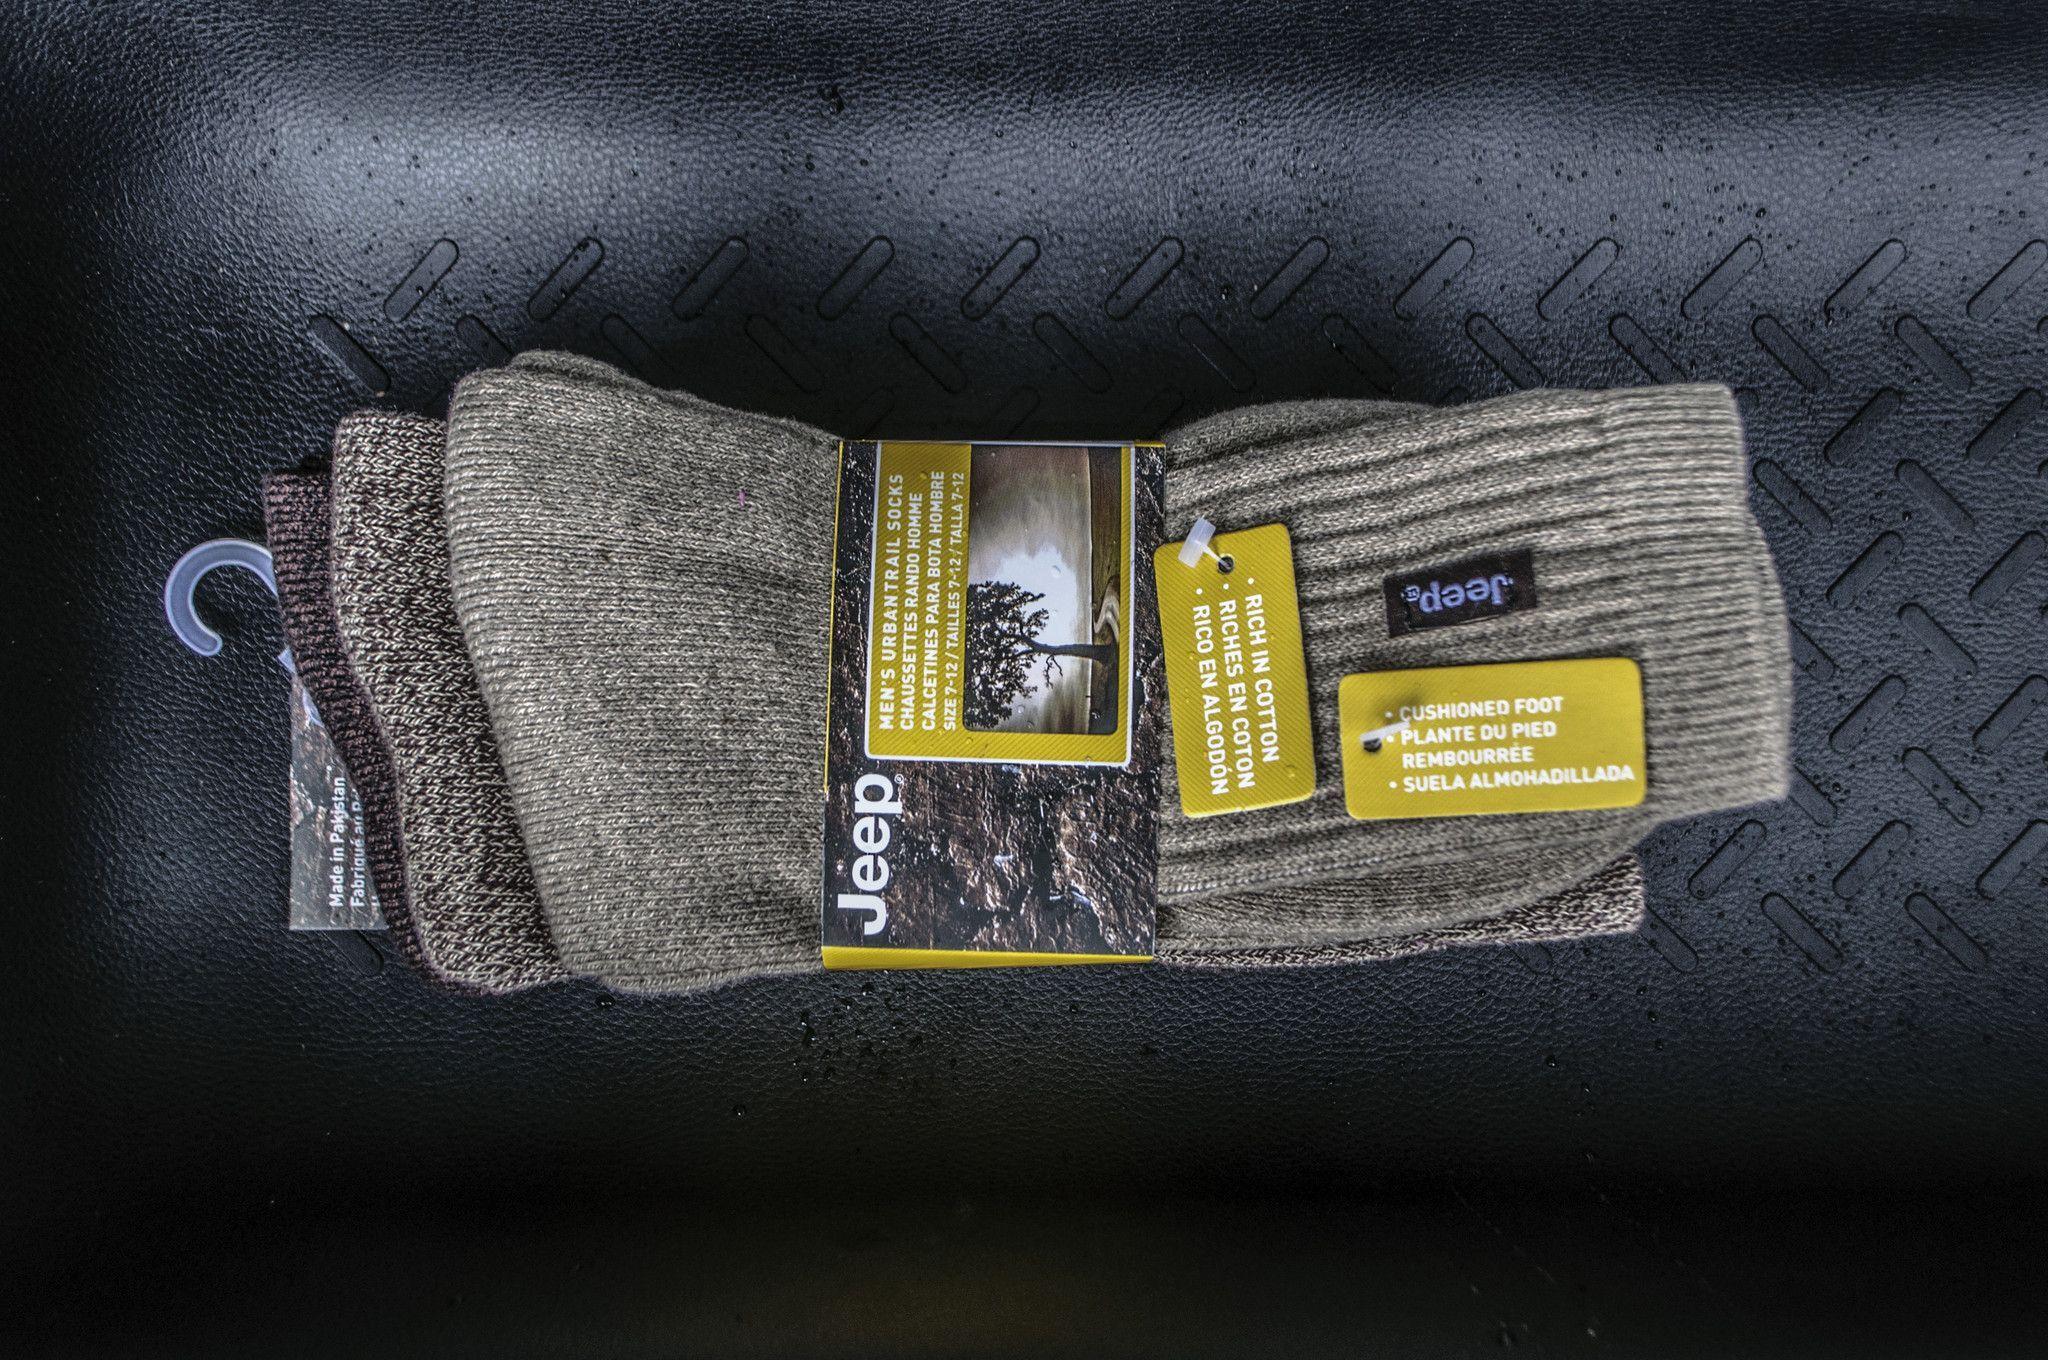 Jeep Men's Cotton / Poly Urban Trail Socks (3-Pair)